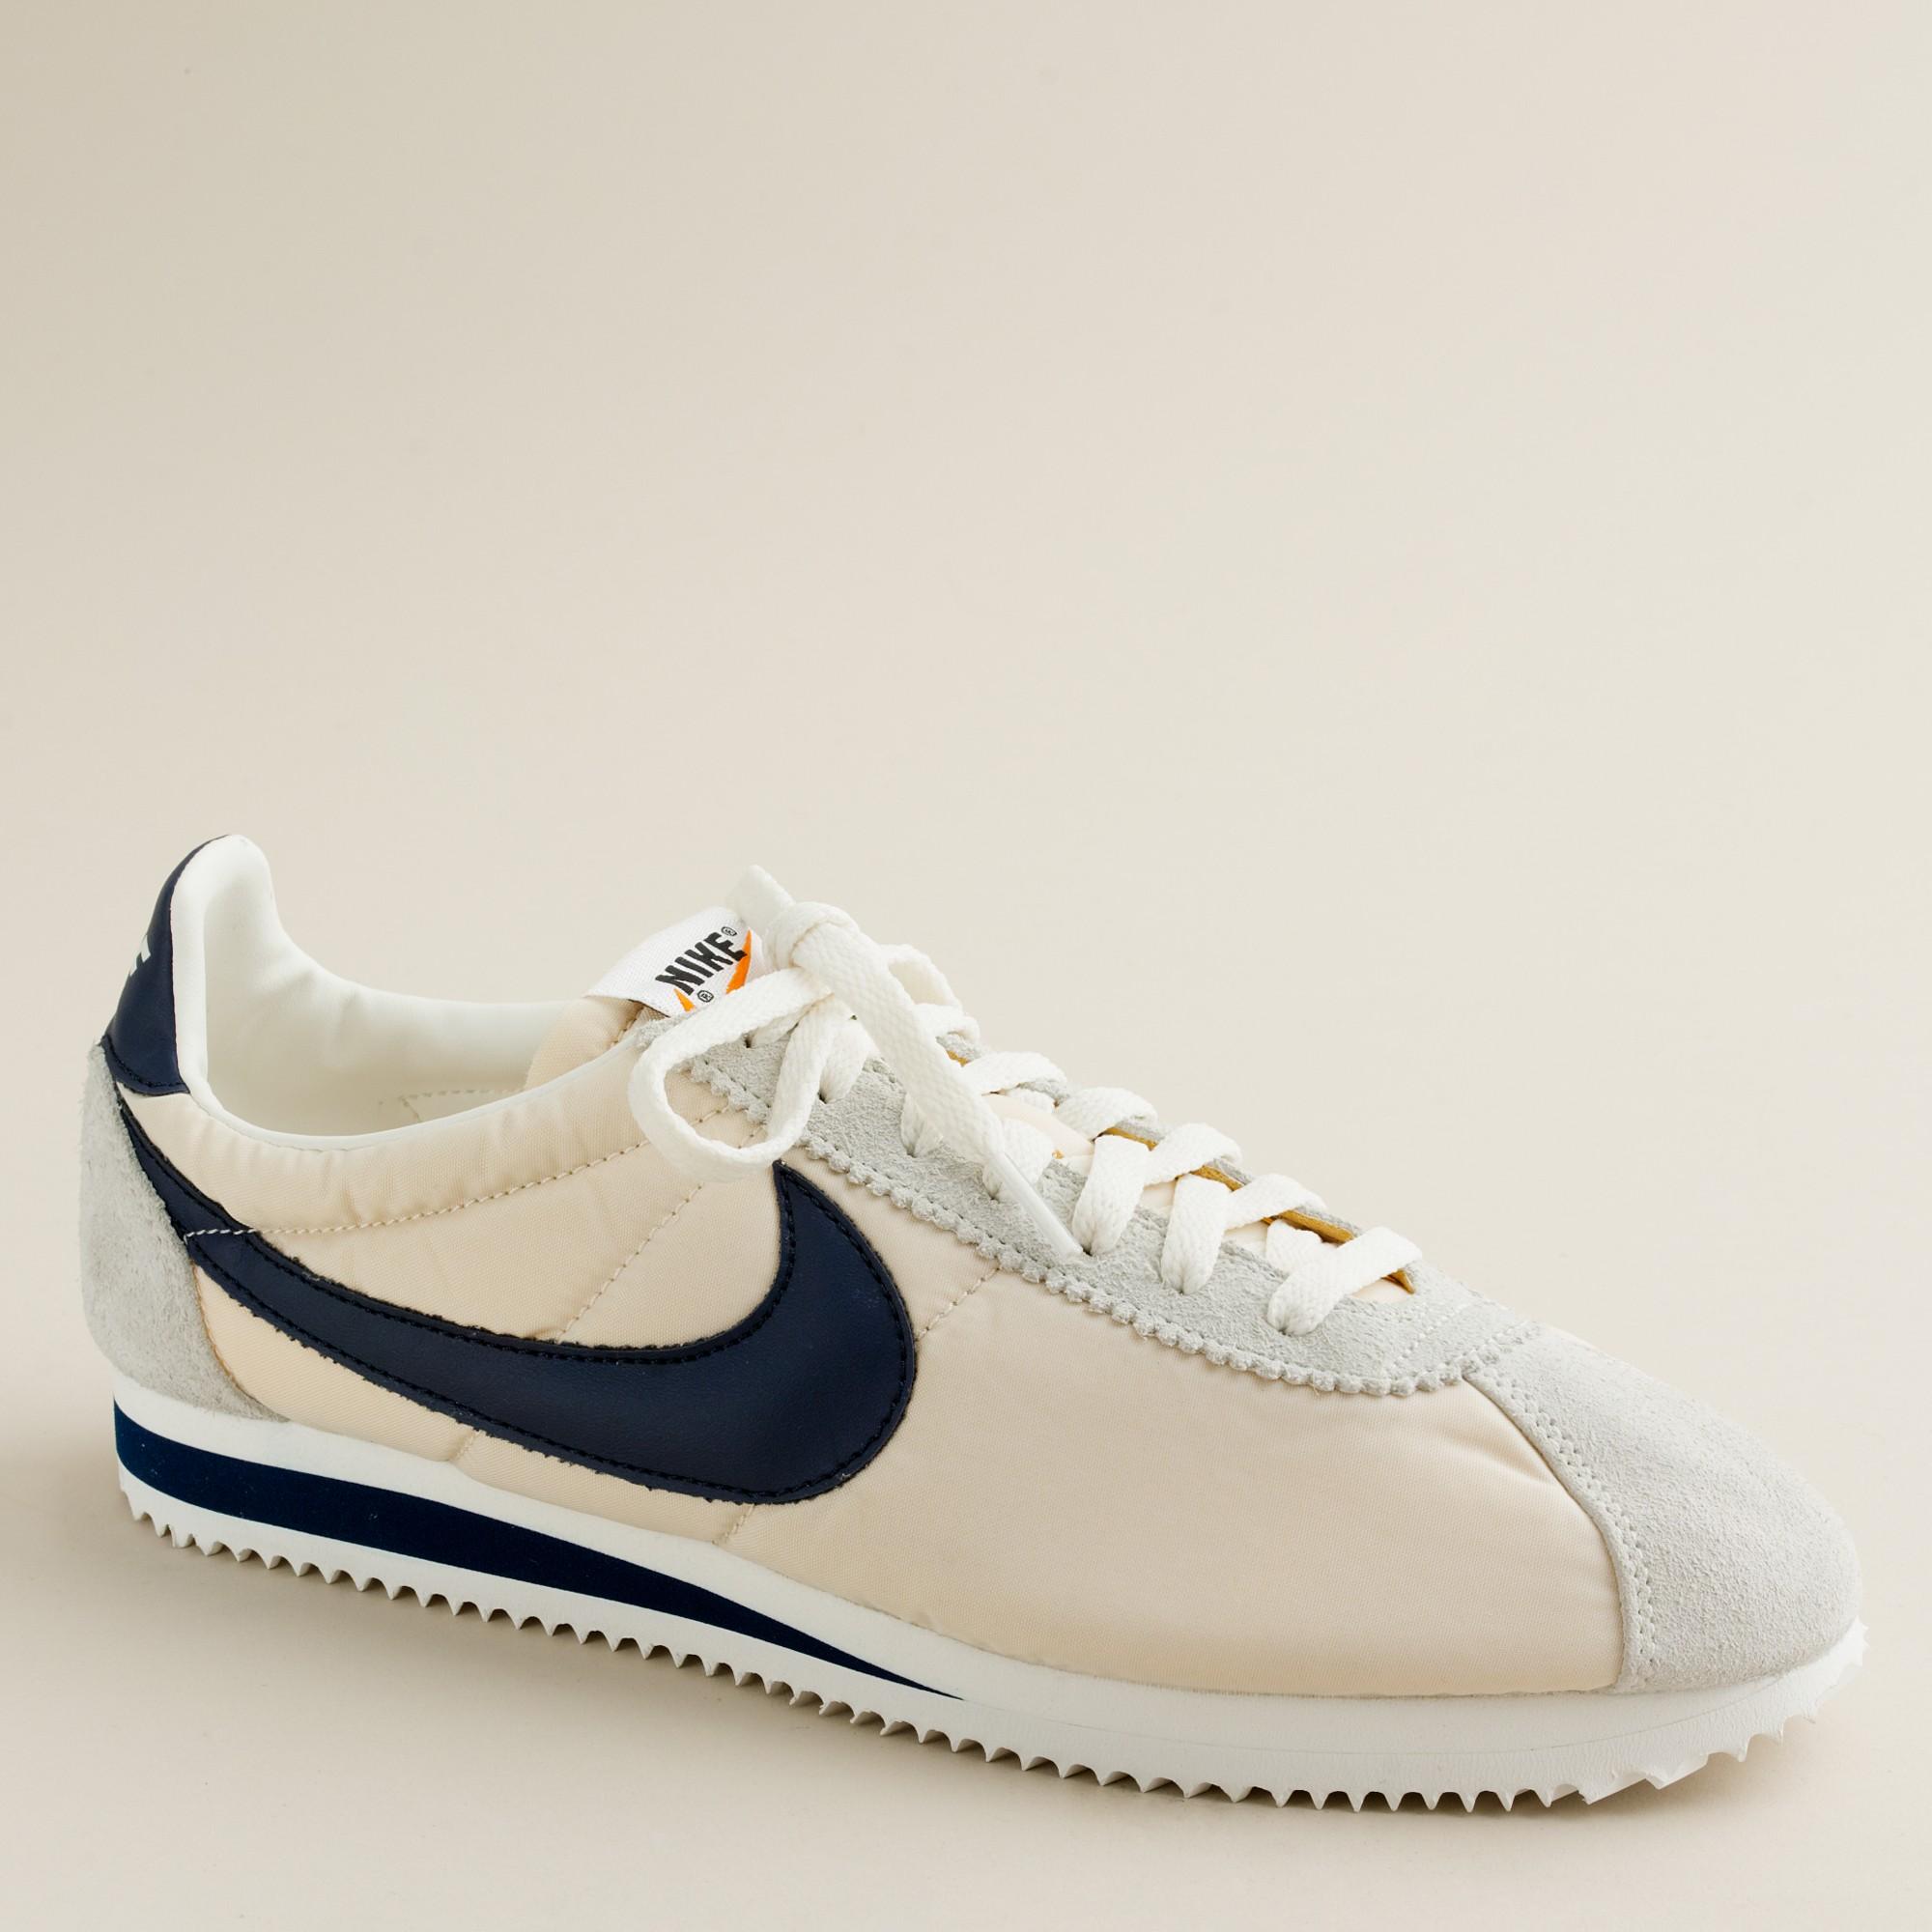 newest 535ac 7e3b6 reduced nike cortez basic men vintage shoes c370145 black white 05daa  5e873  best price lyst j.crew nike for j.crew vintage collection cortez  sneakers b541e